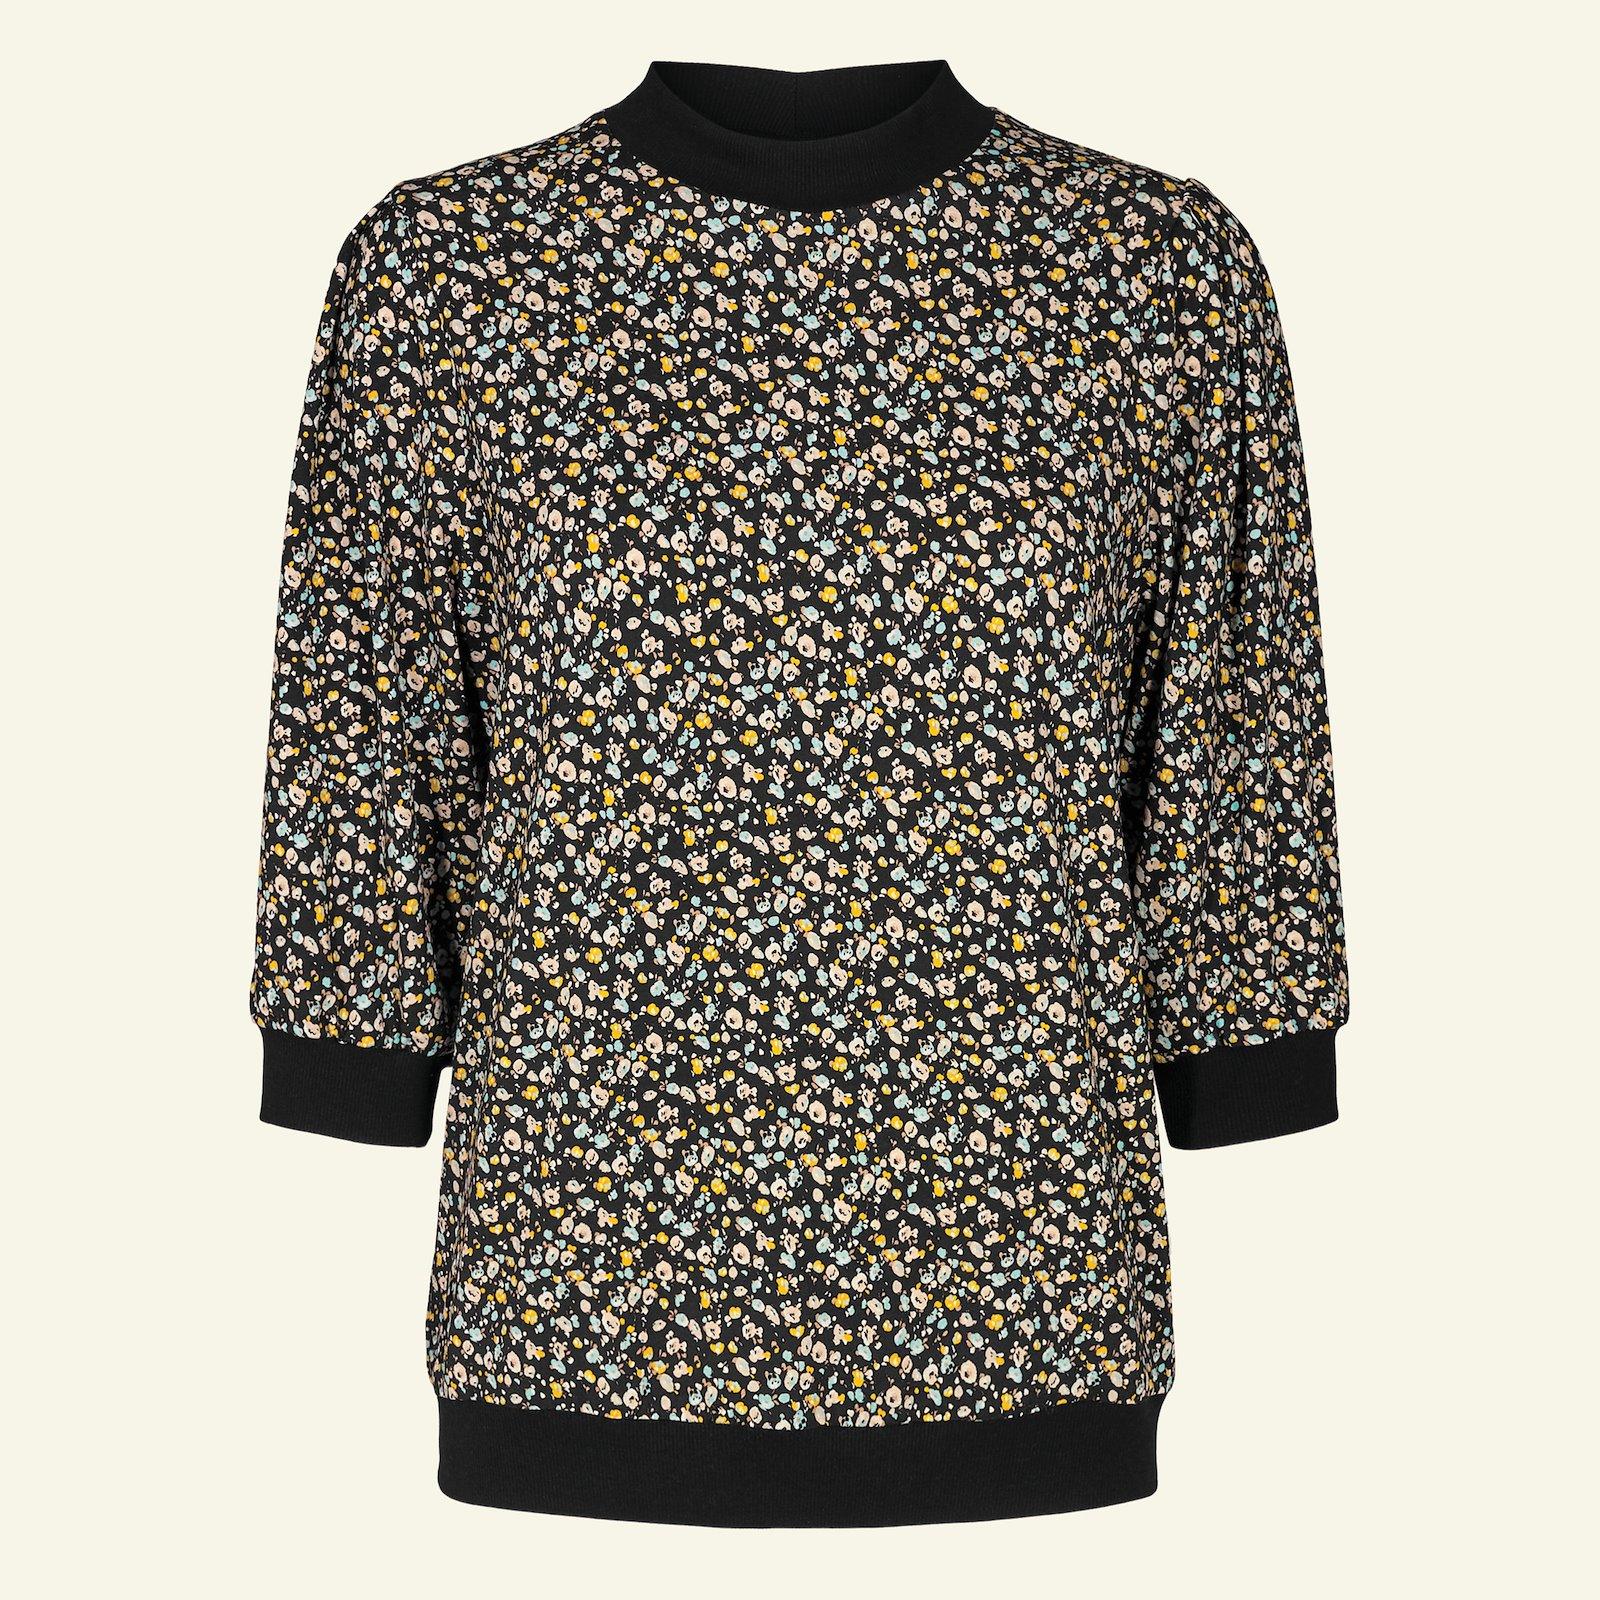 Sweatshirt with puff sleeves, M p22074_272618_272436_sskit